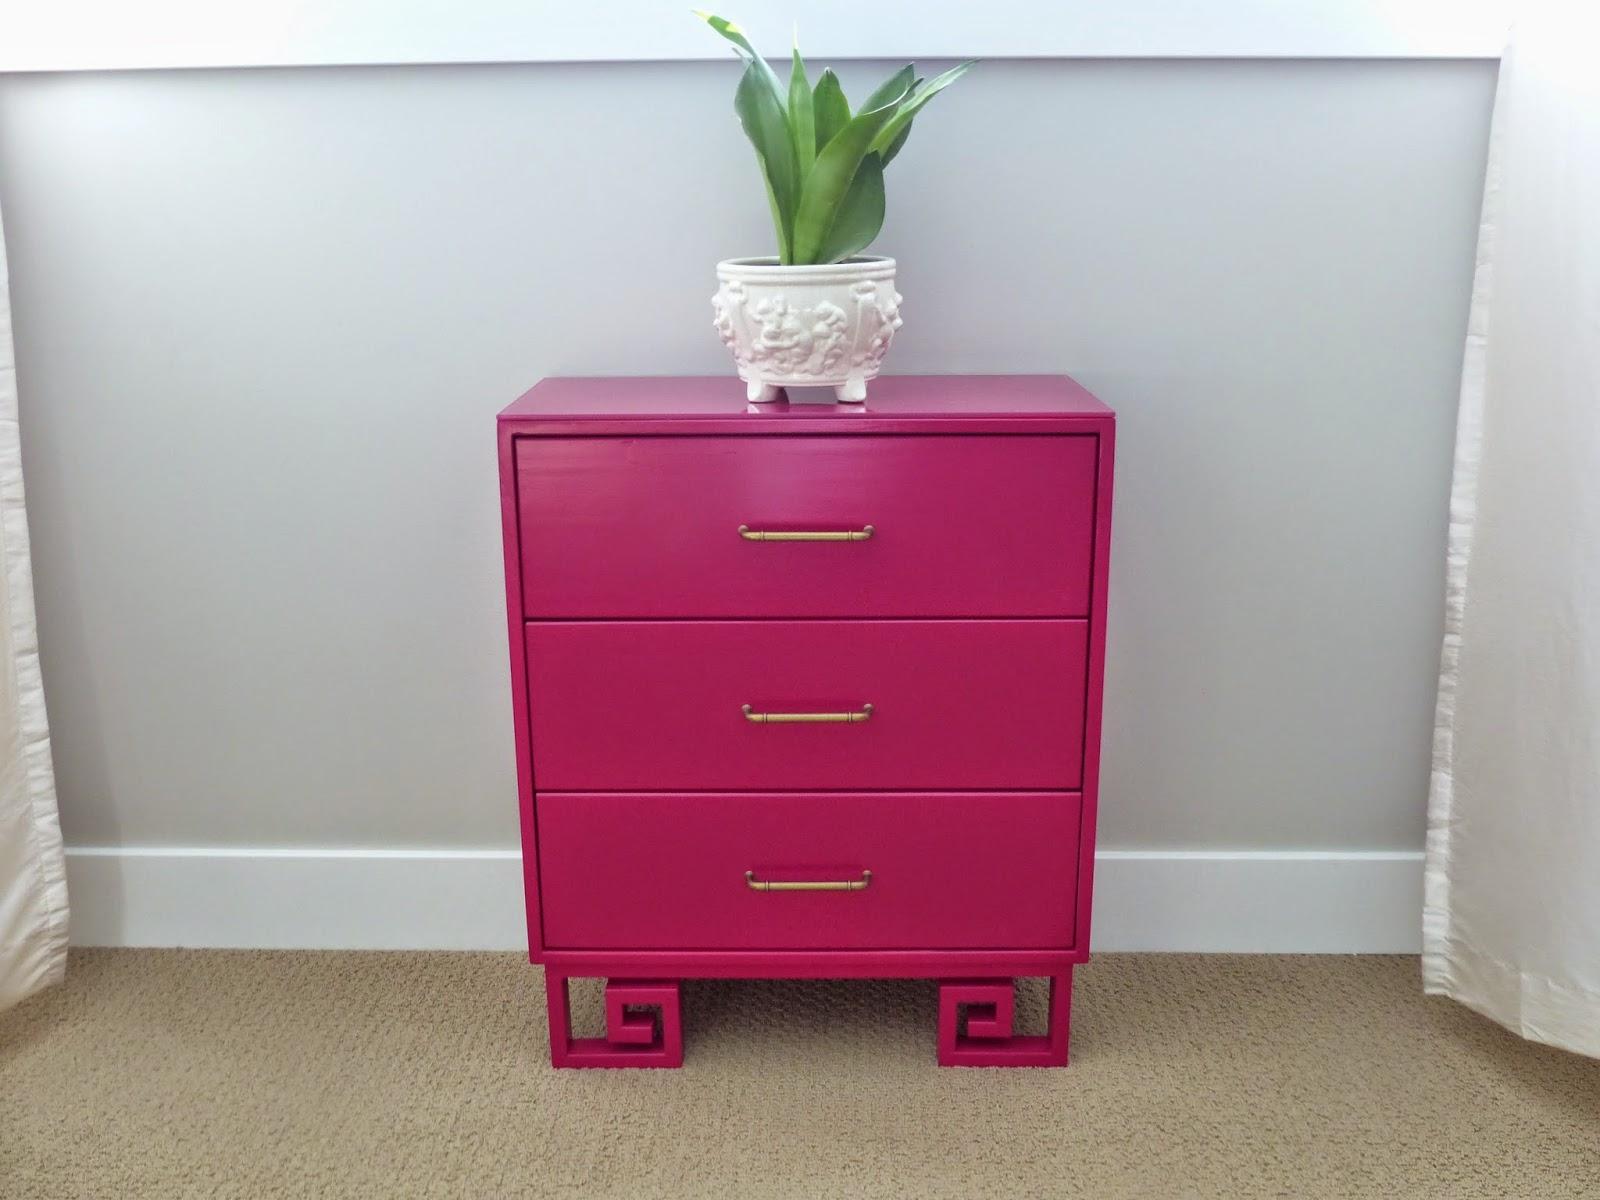 julie peterson simple redesign ikea rast hack before. Black Bedroom Furniture Sets. Home Design Ideas